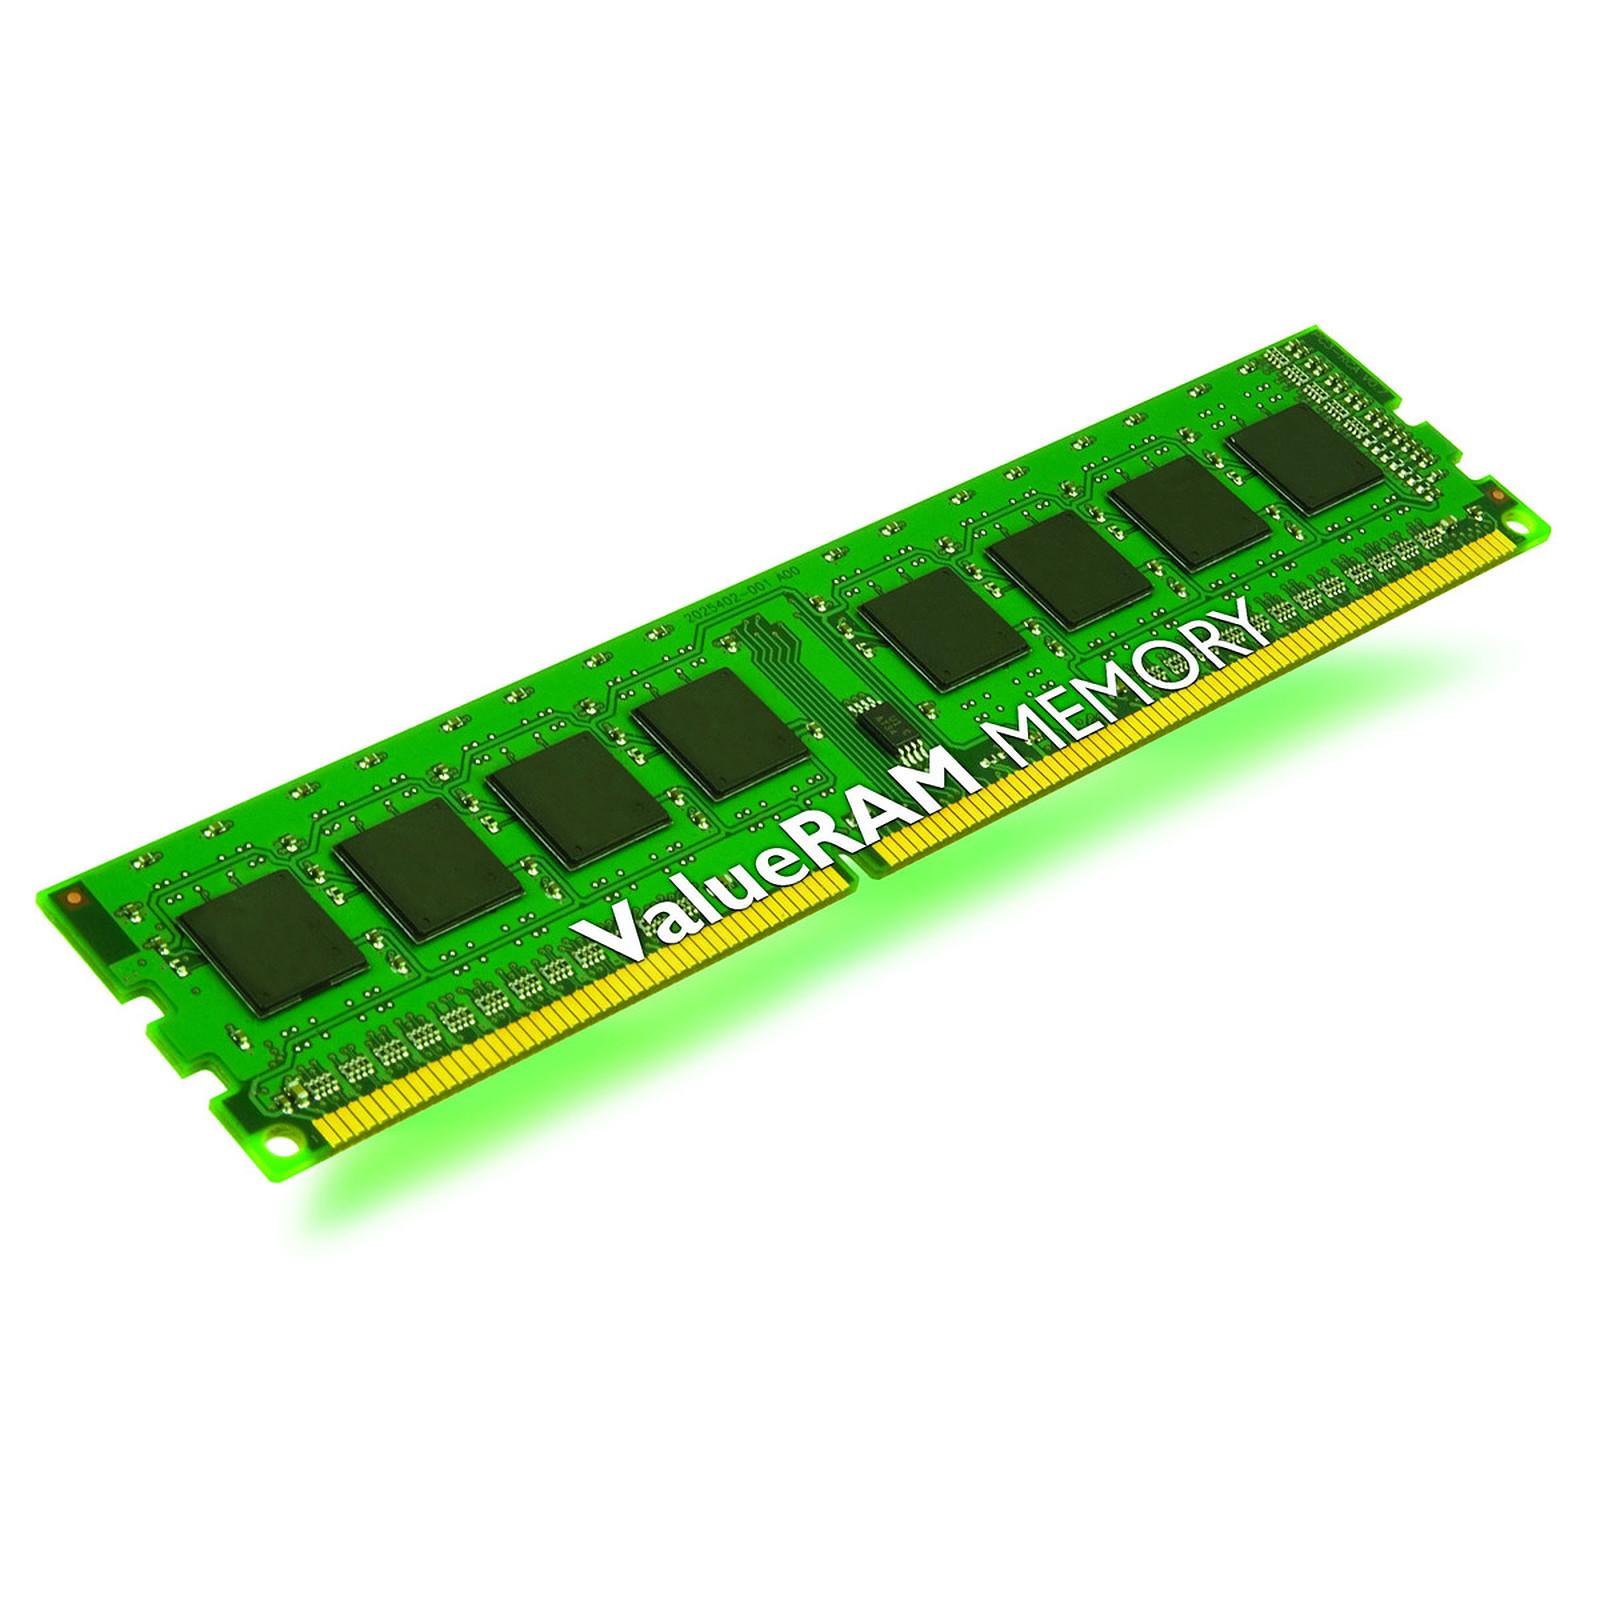 Kingston ValueRAM 8 Go DDR3 1066 MHz ECC Registered CL7 QR X8